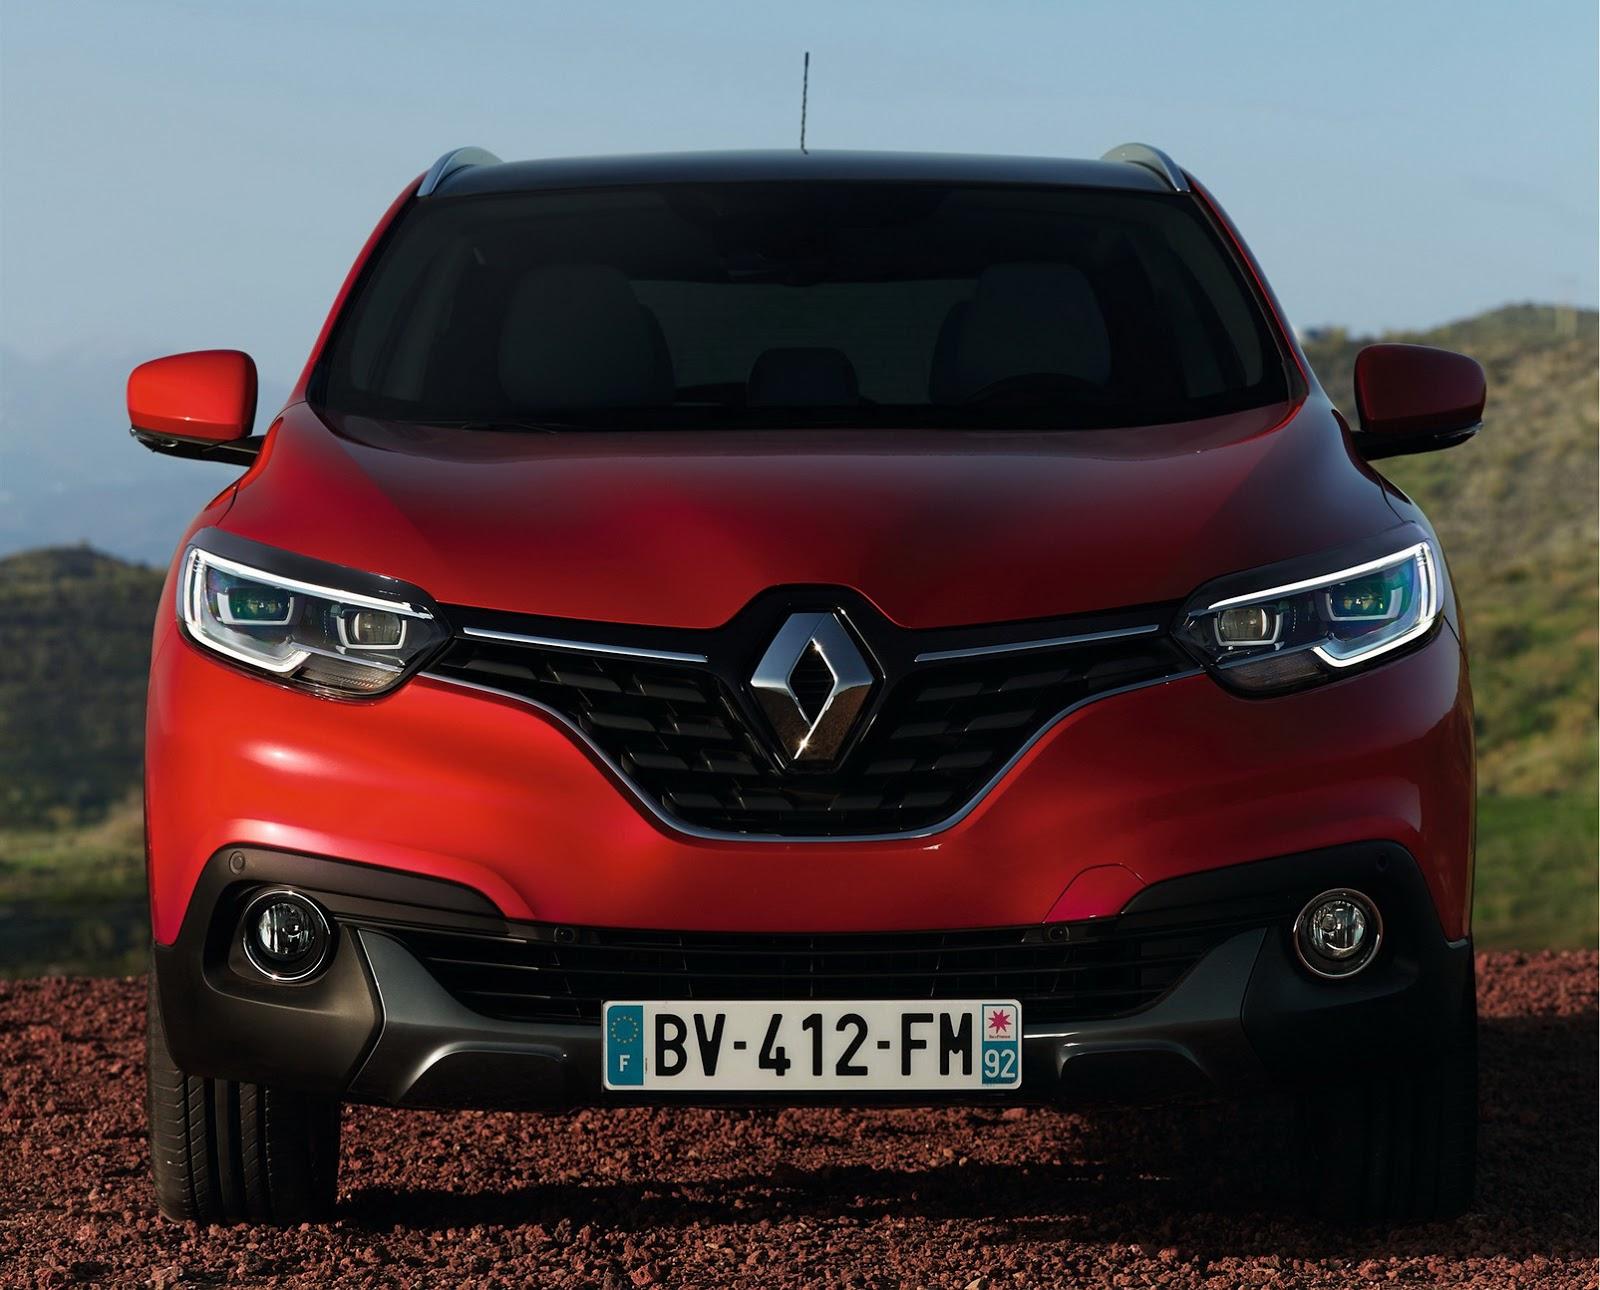 Renault Kadjar Price Announced for Europe - autoevolution